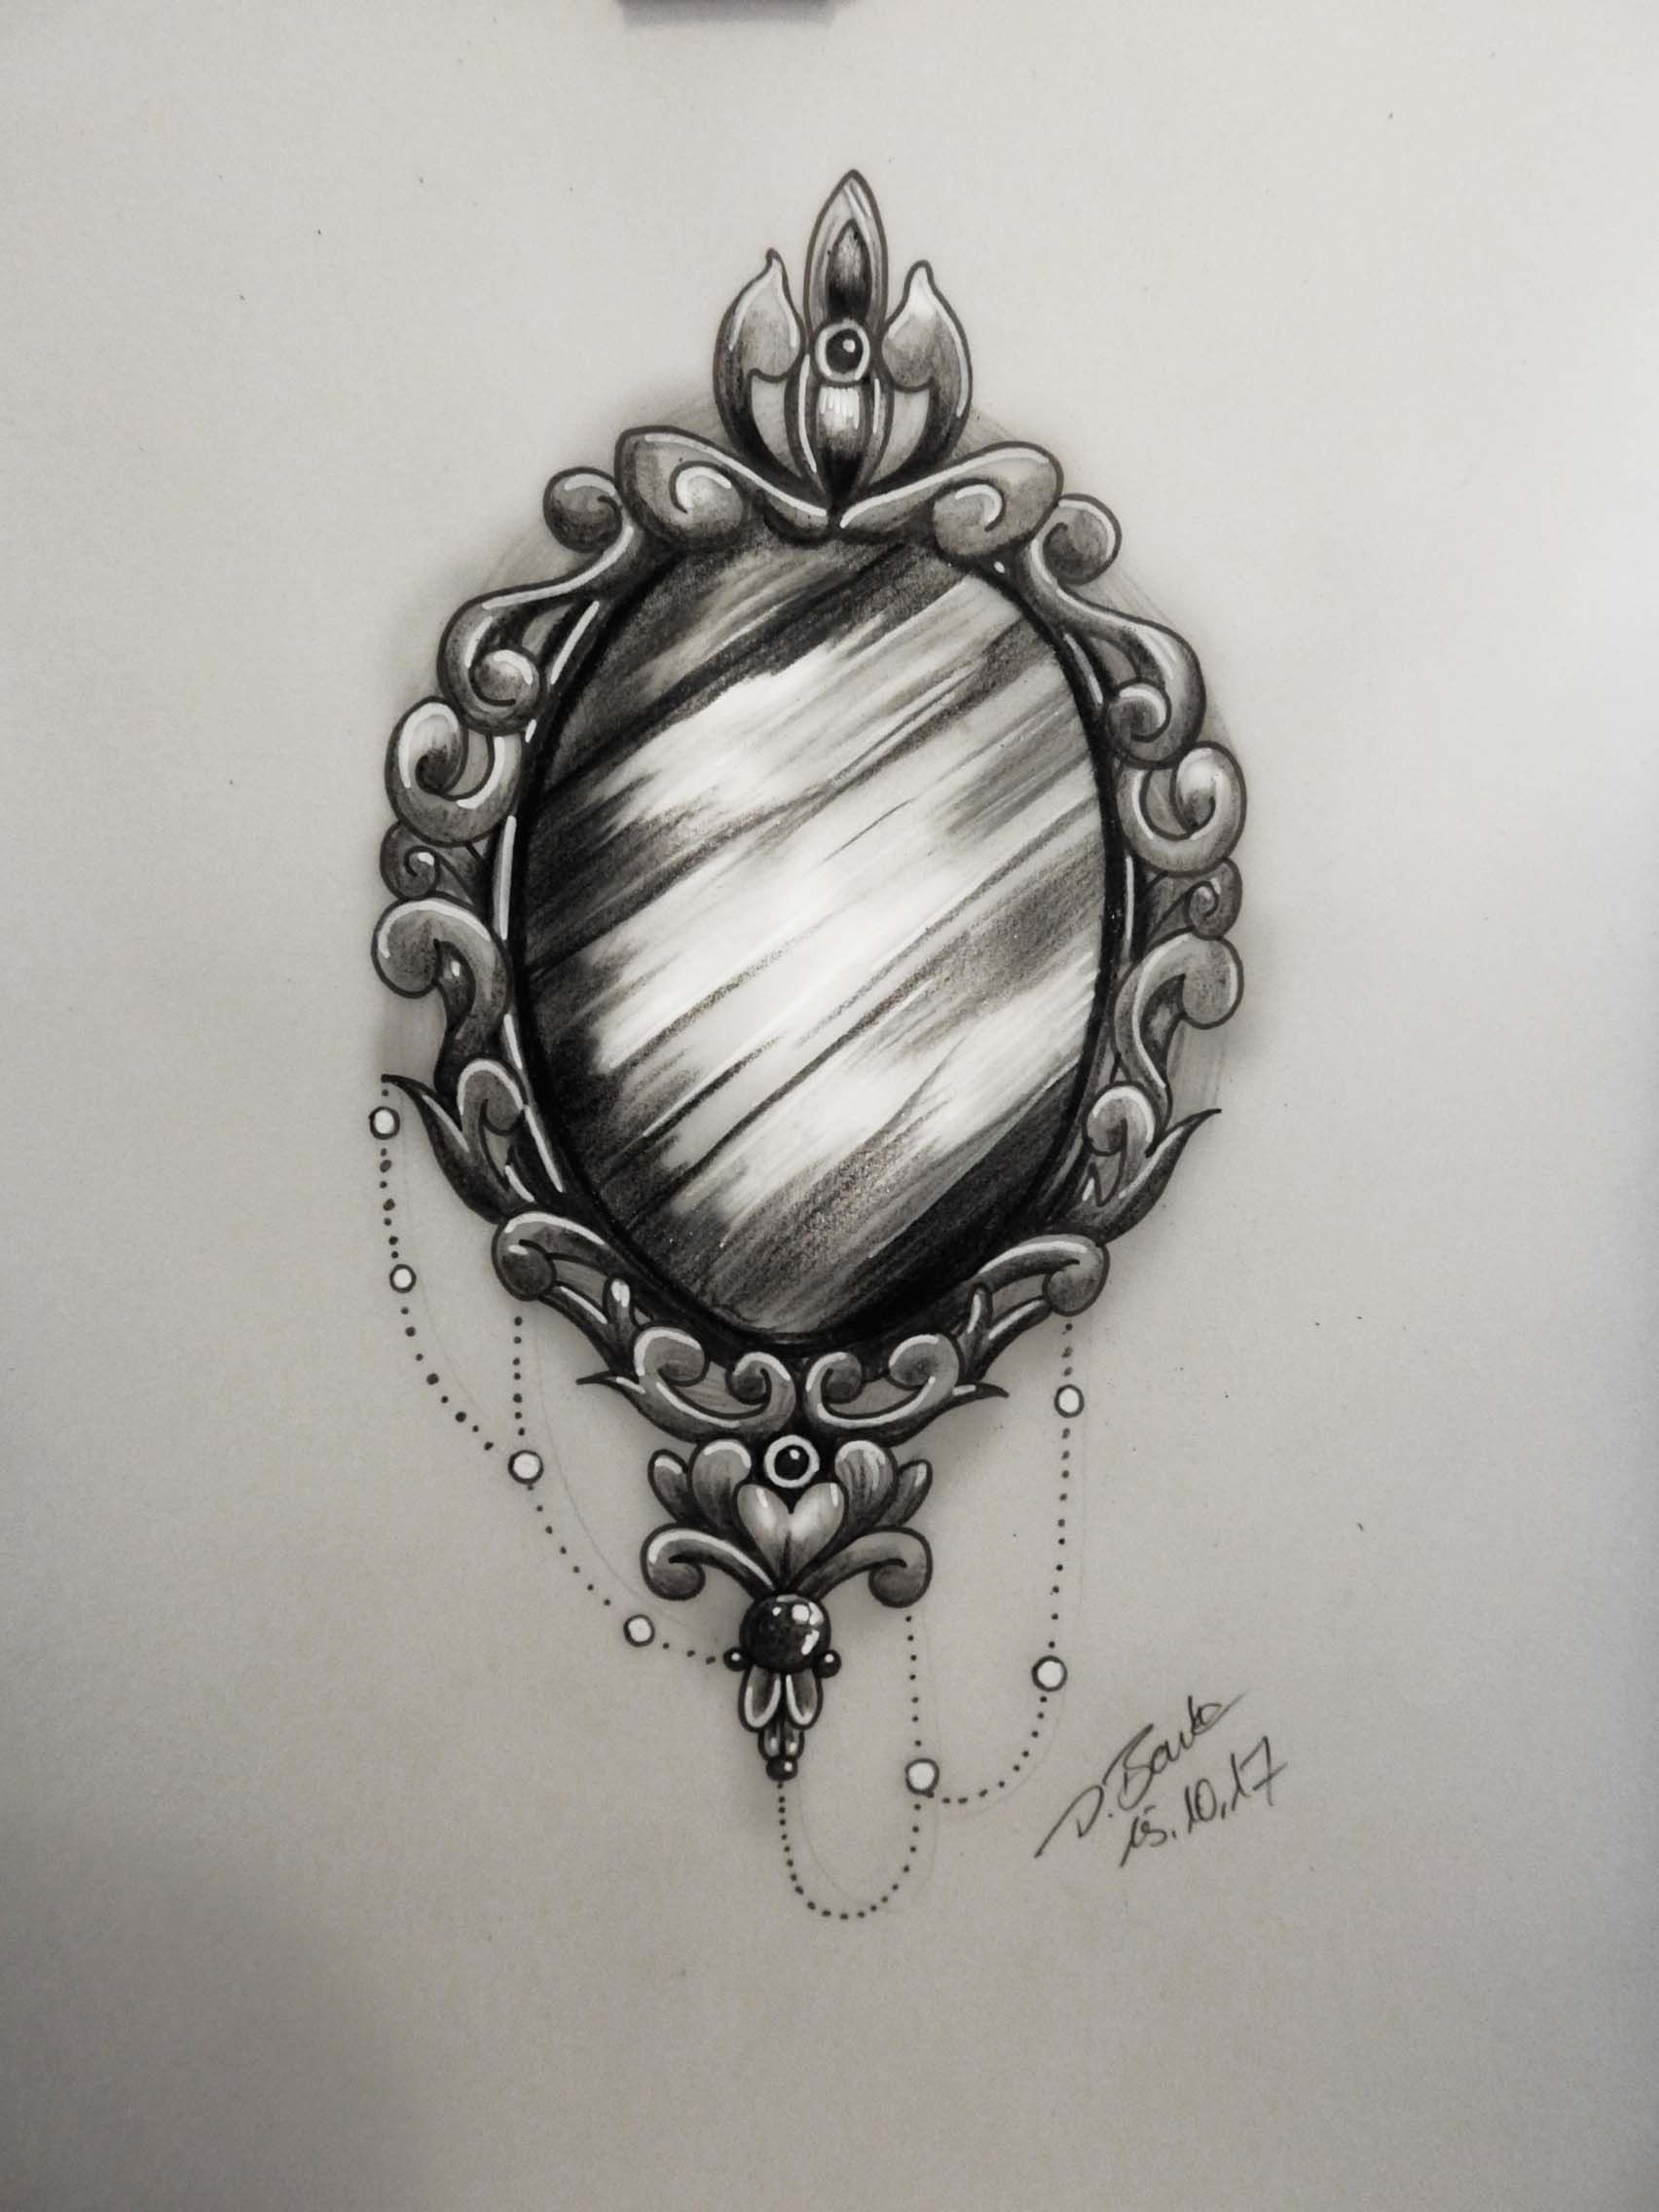 Pin By Consuelo Romero On Tattoo Designs Mirror Tattoos Tattoos Tattoo Drawings